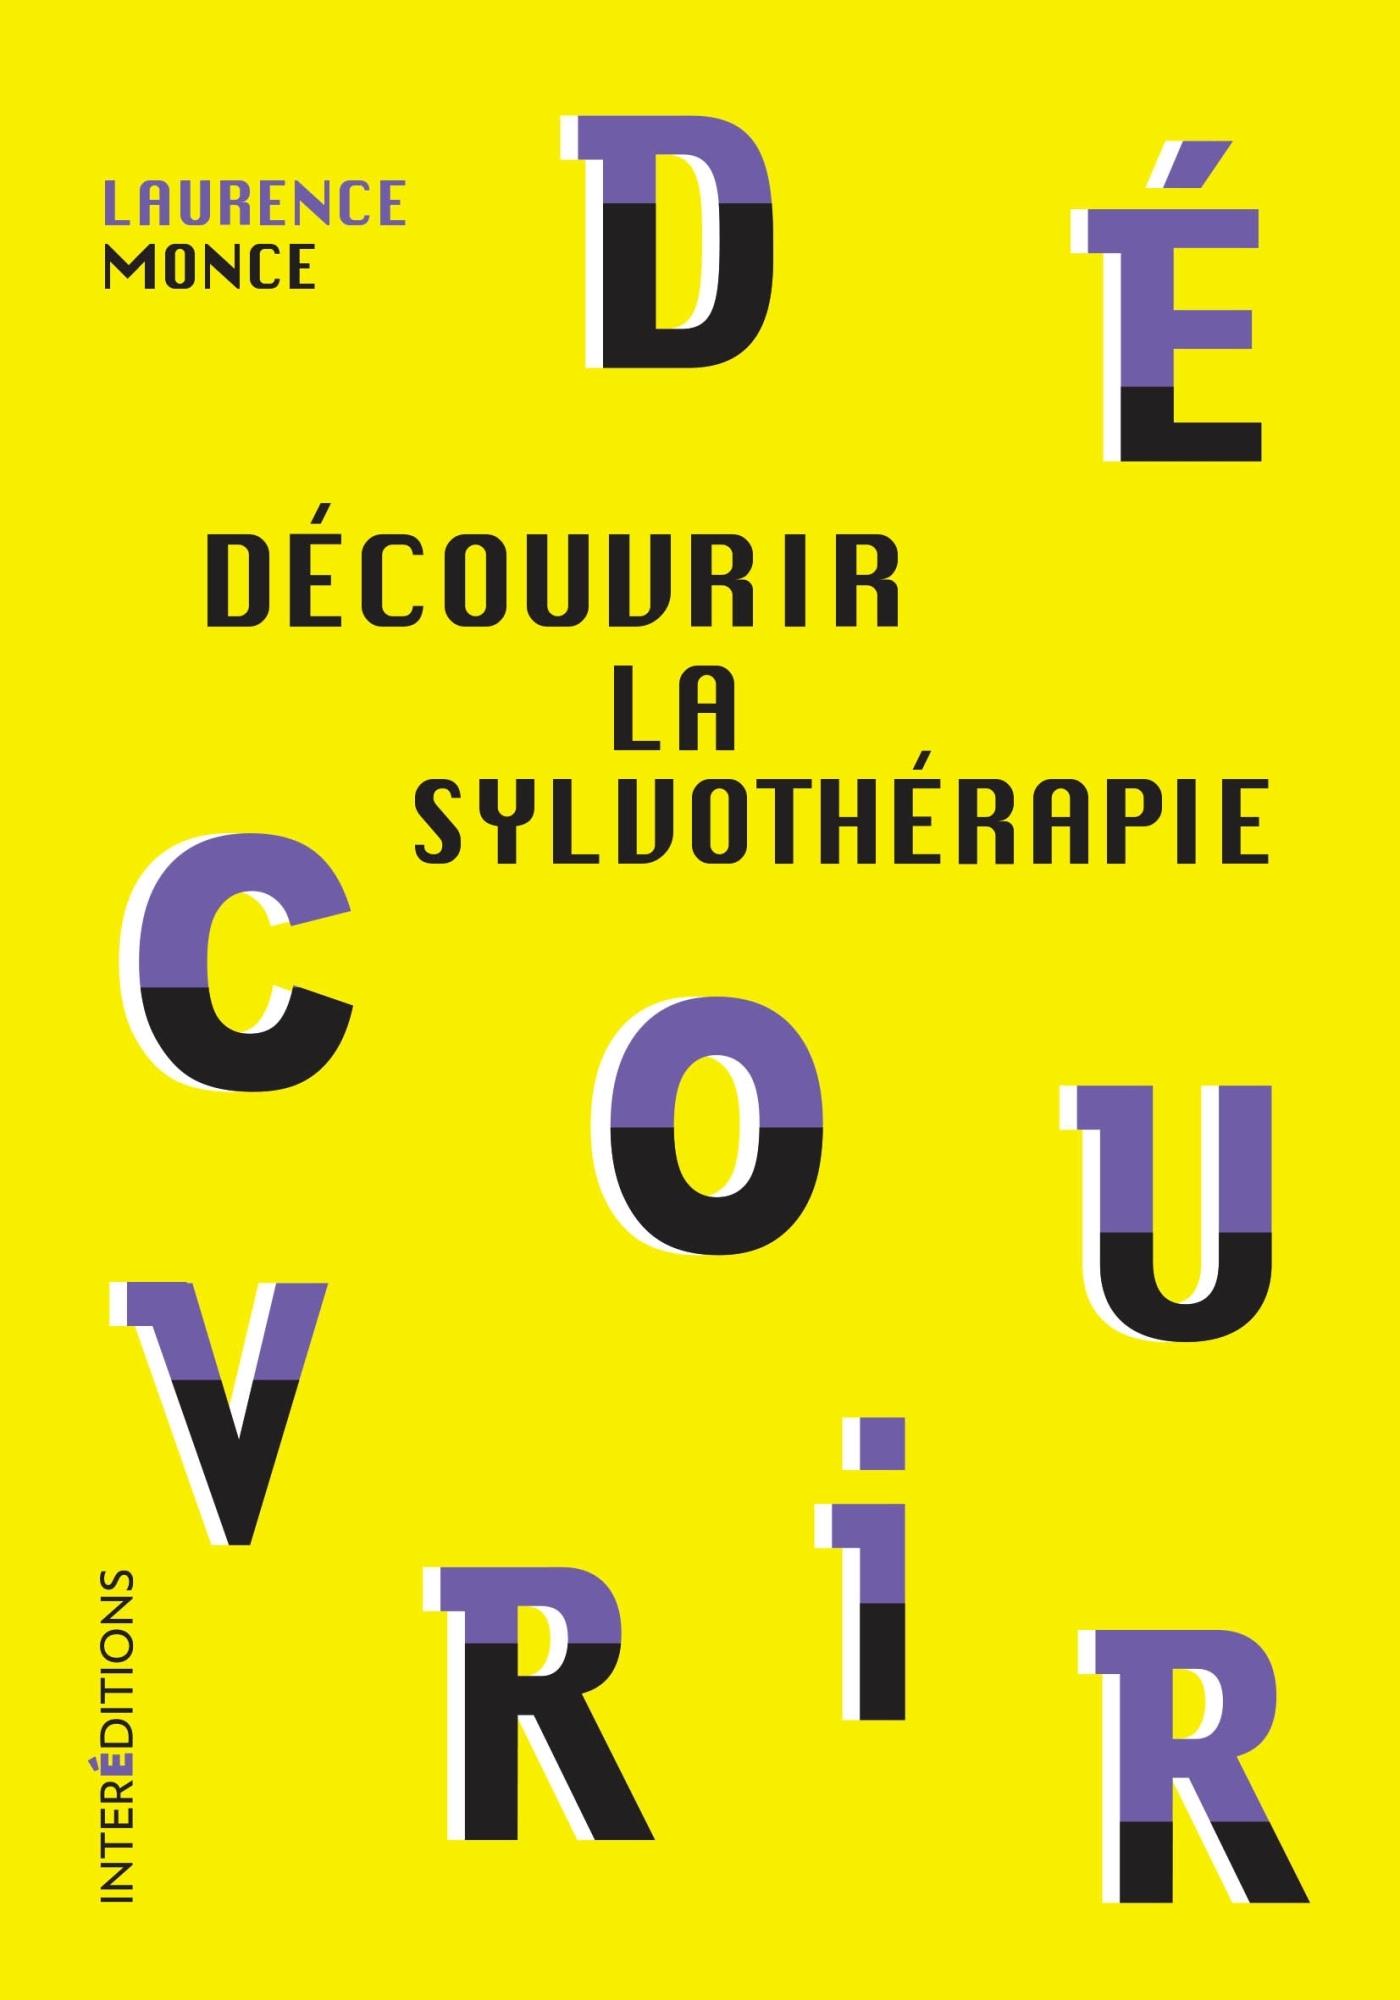 DECOUVRIR LA SYLVOTHERAPIE